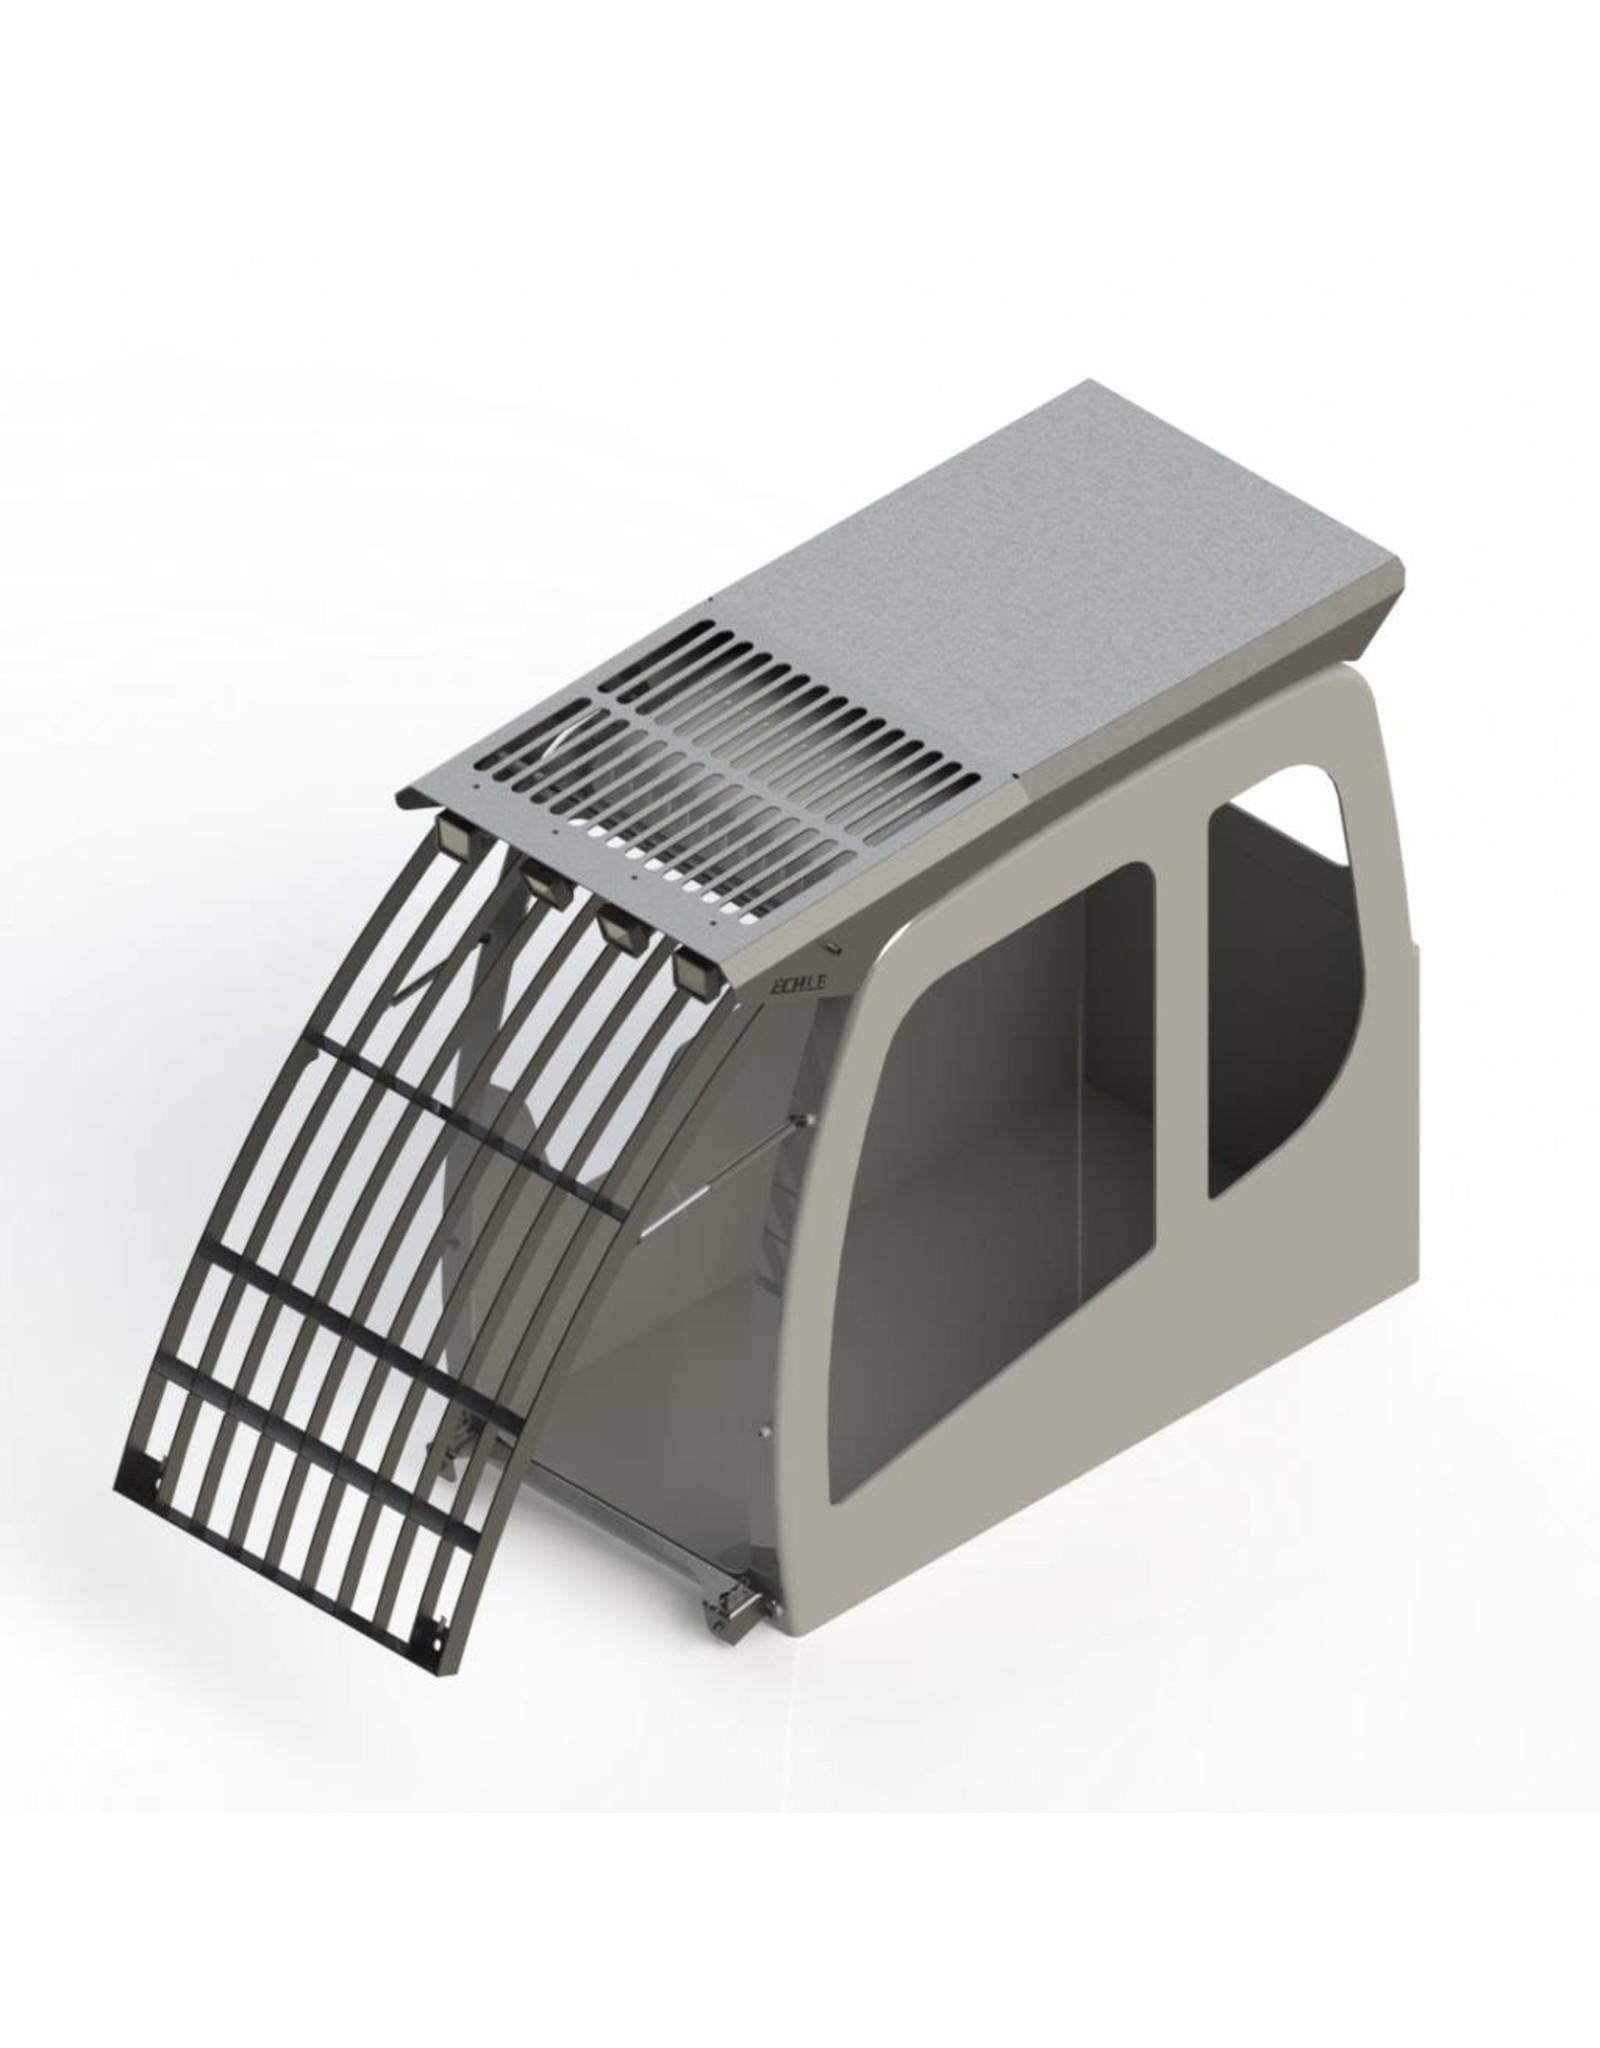 Echle Hartstahl GmbH FOPS for CAT 315F